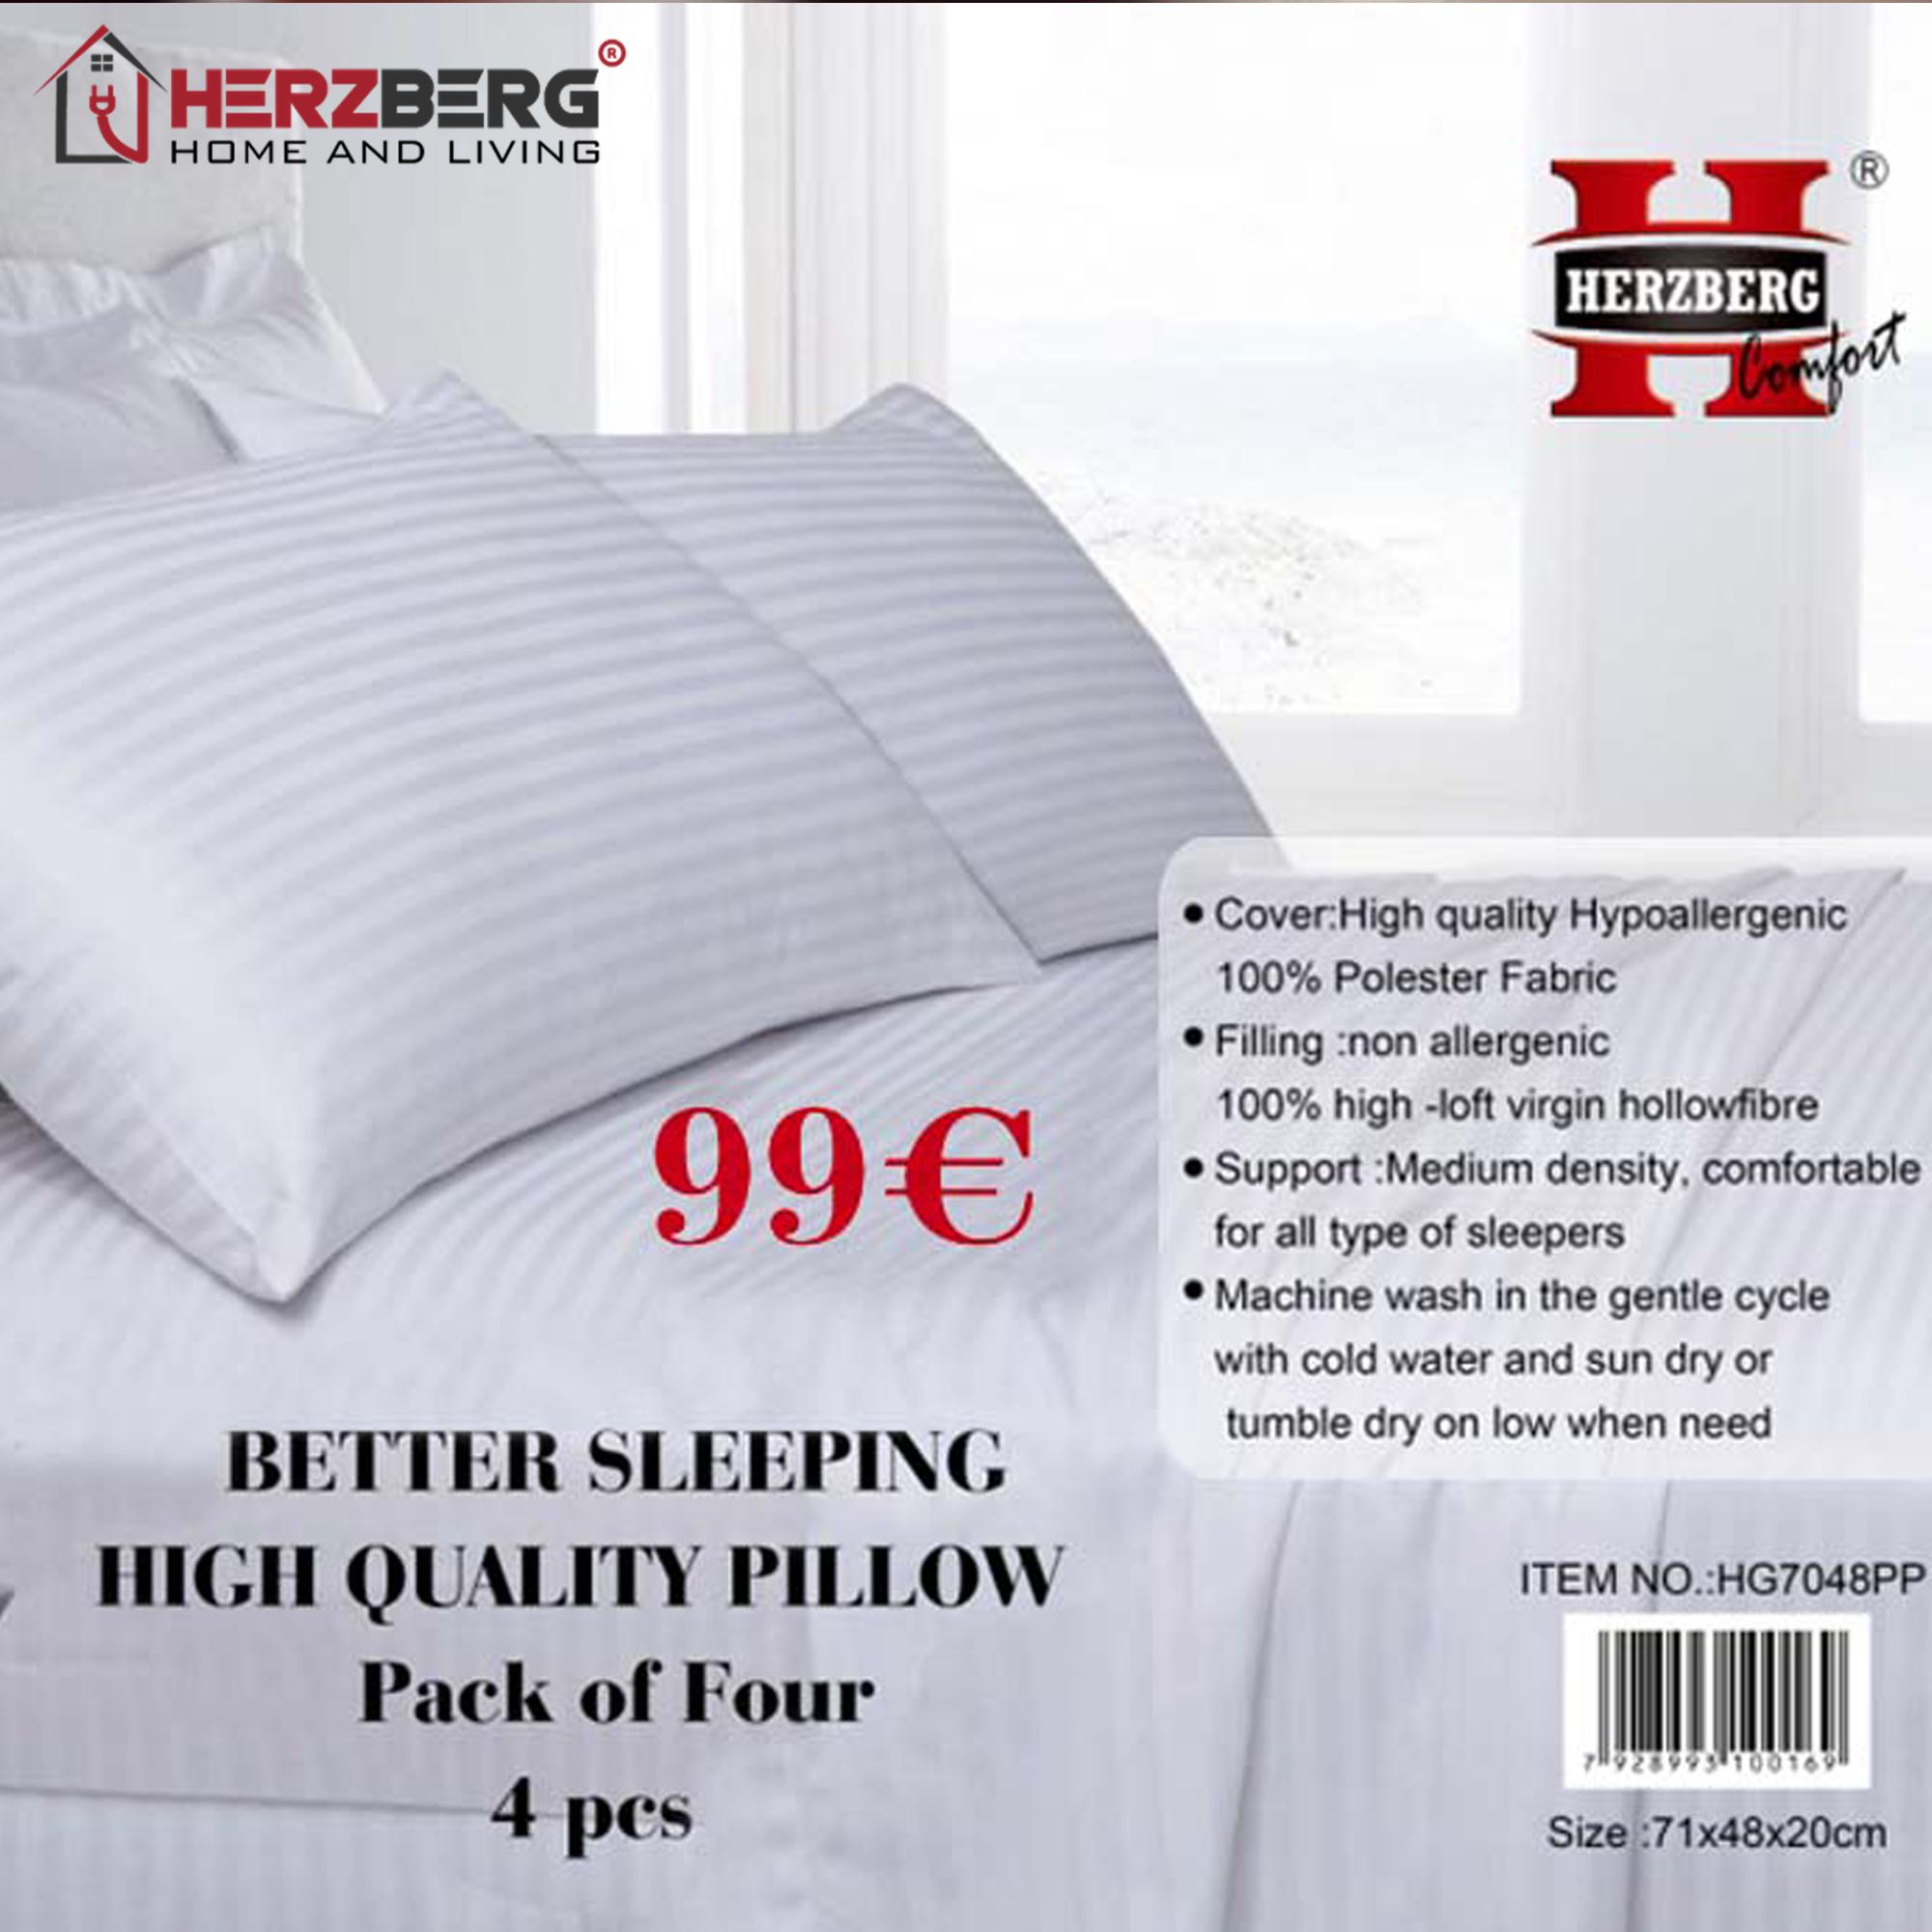 700W Reiskocher Multifunktionsherd 1.8L Herzberg HG-8005